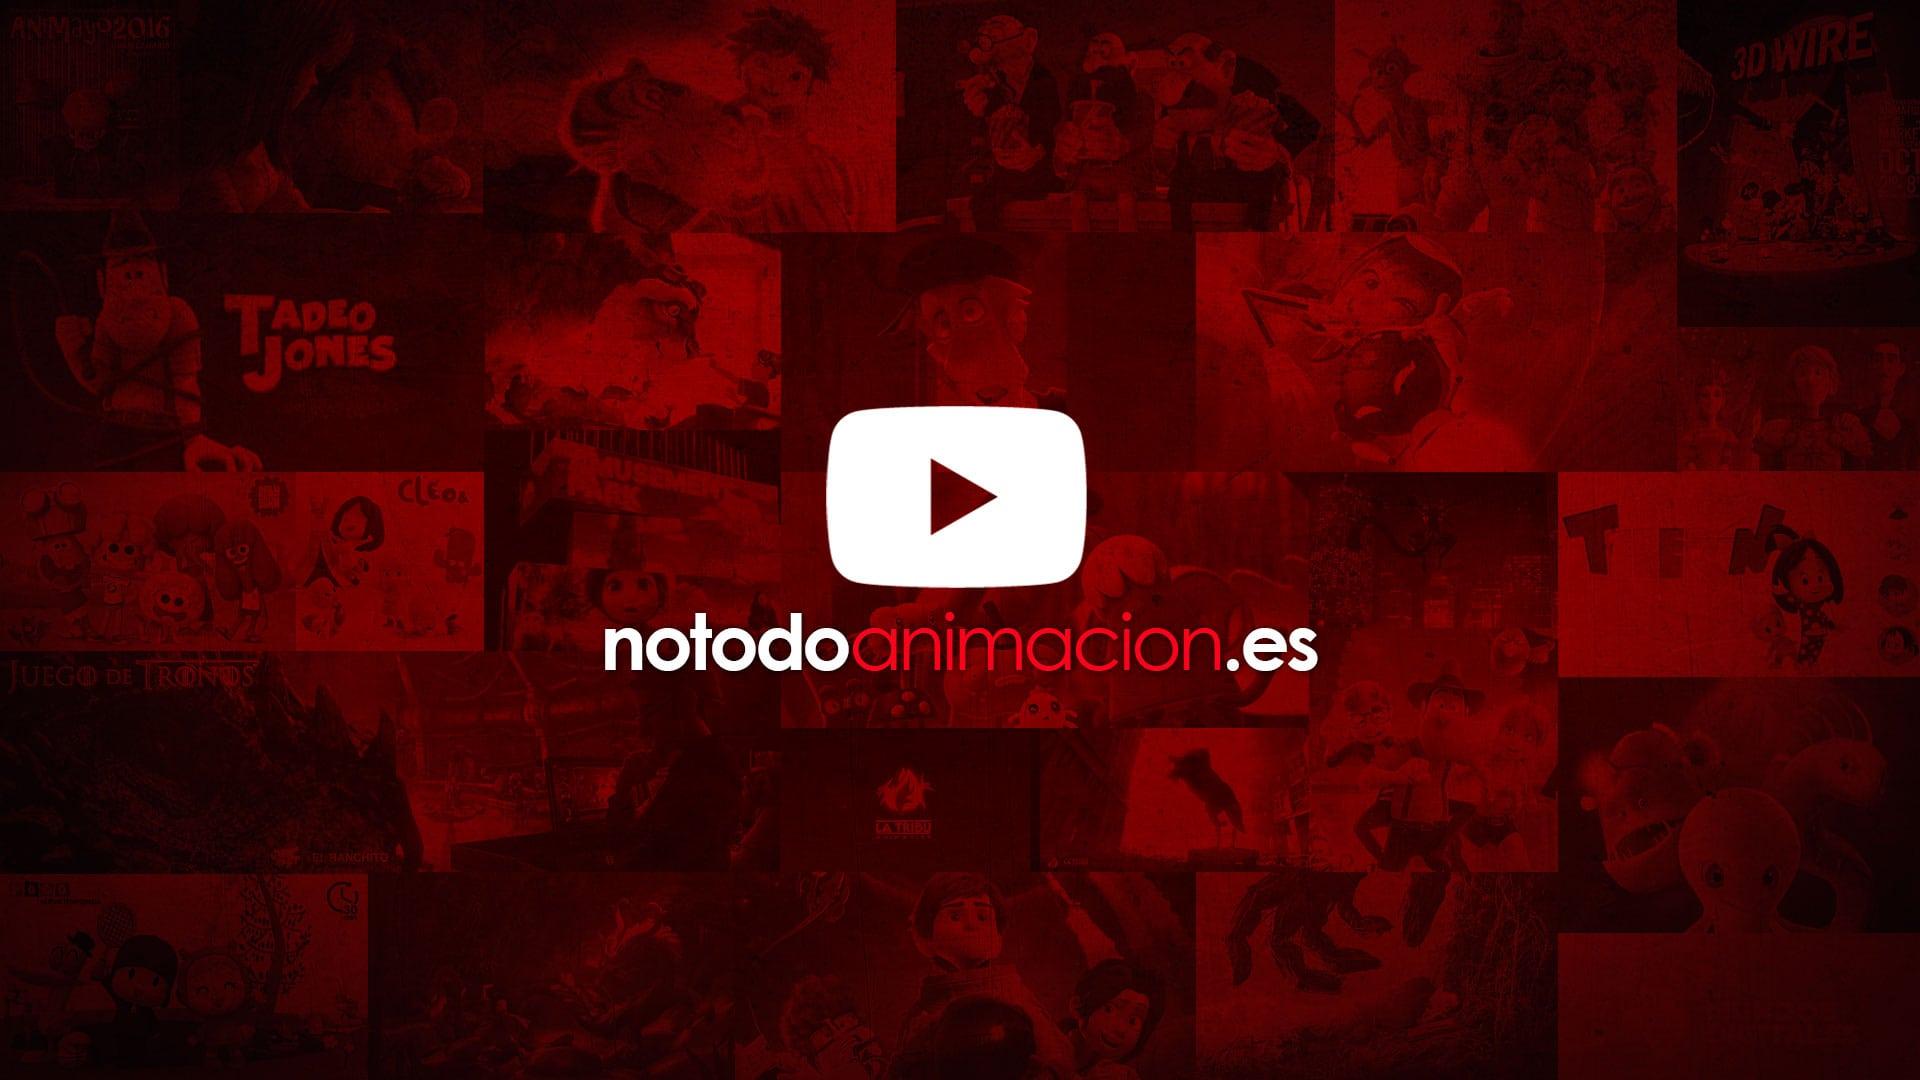 cortos de animación 2d 3d